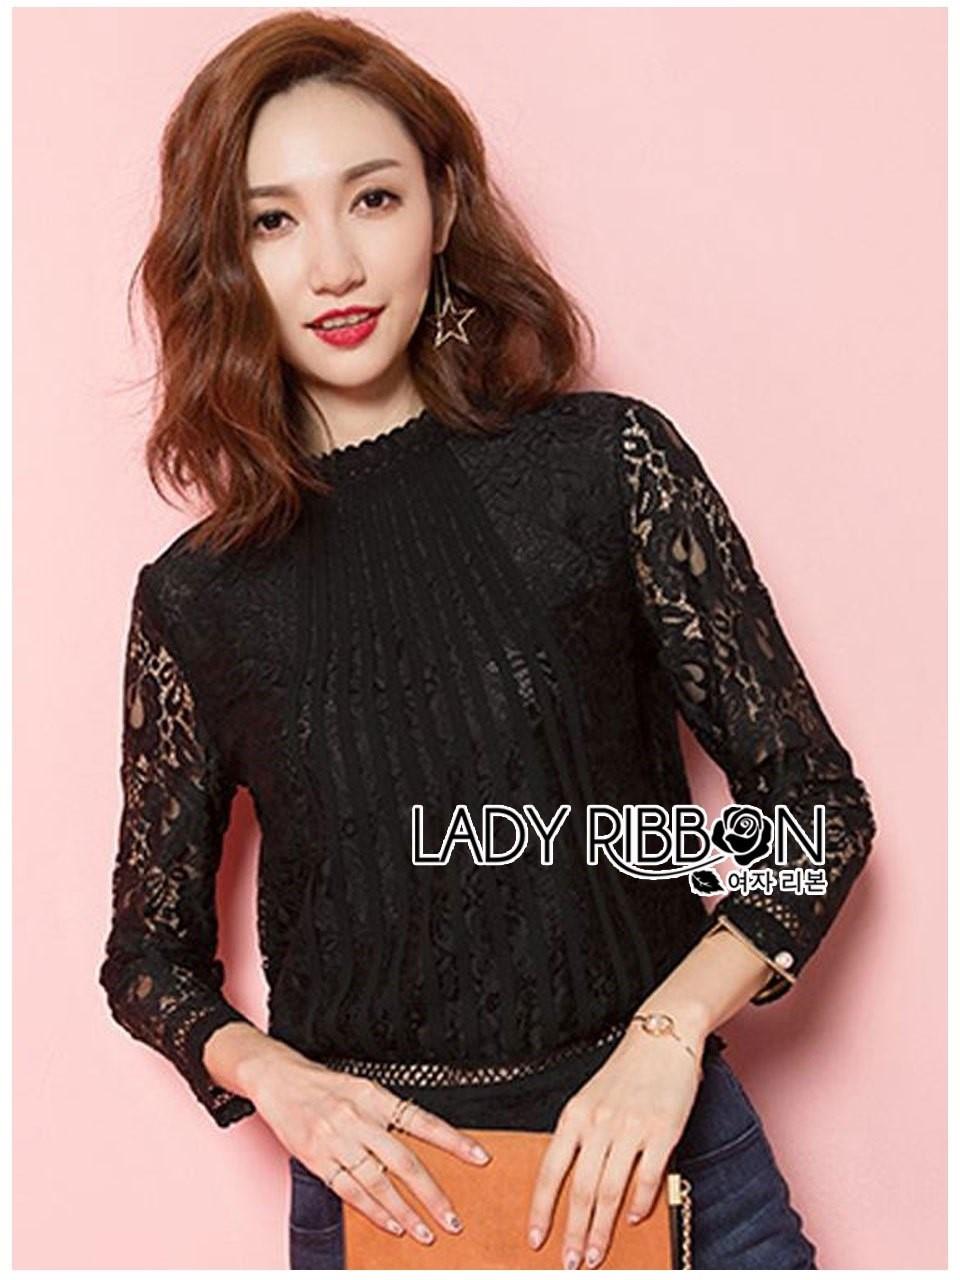 &#x1F380 Lady Ribbon's Made &#x1F380 Lady Becca Smart Elegant High-Neck White Lace Blouse